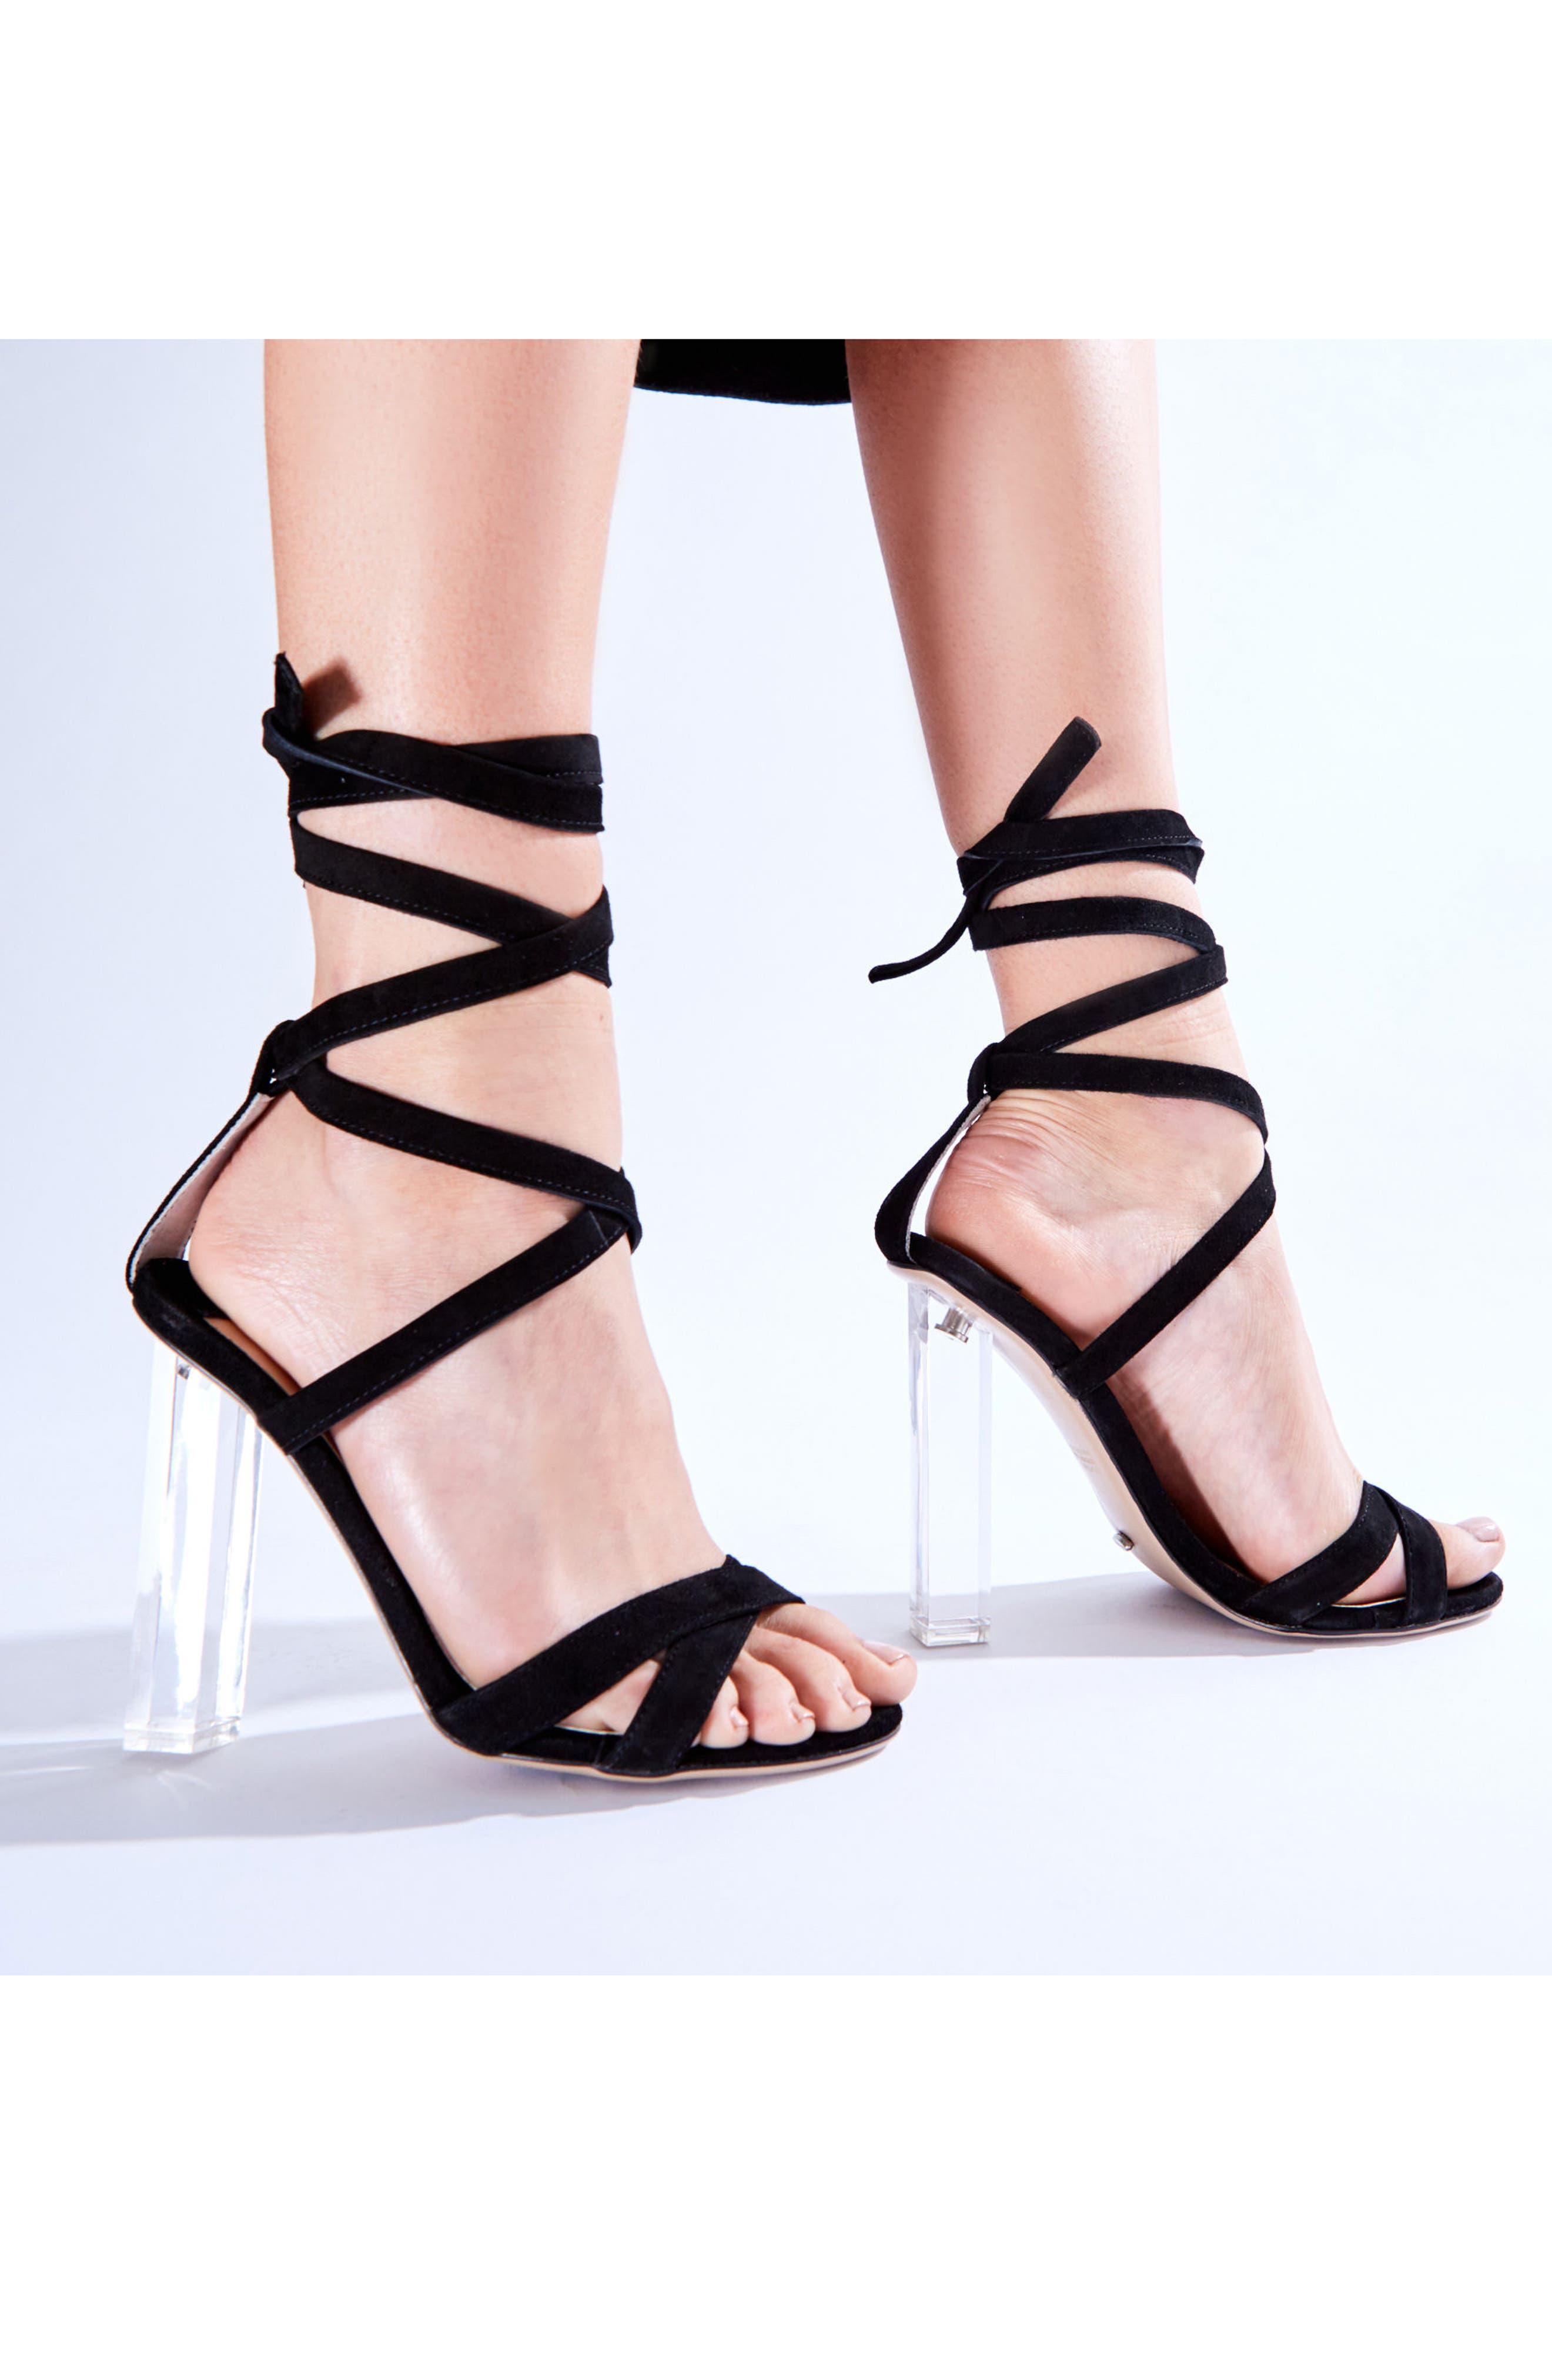 Komma Translucent Heel Sandal,                             Alternate thumbnail 9, color,